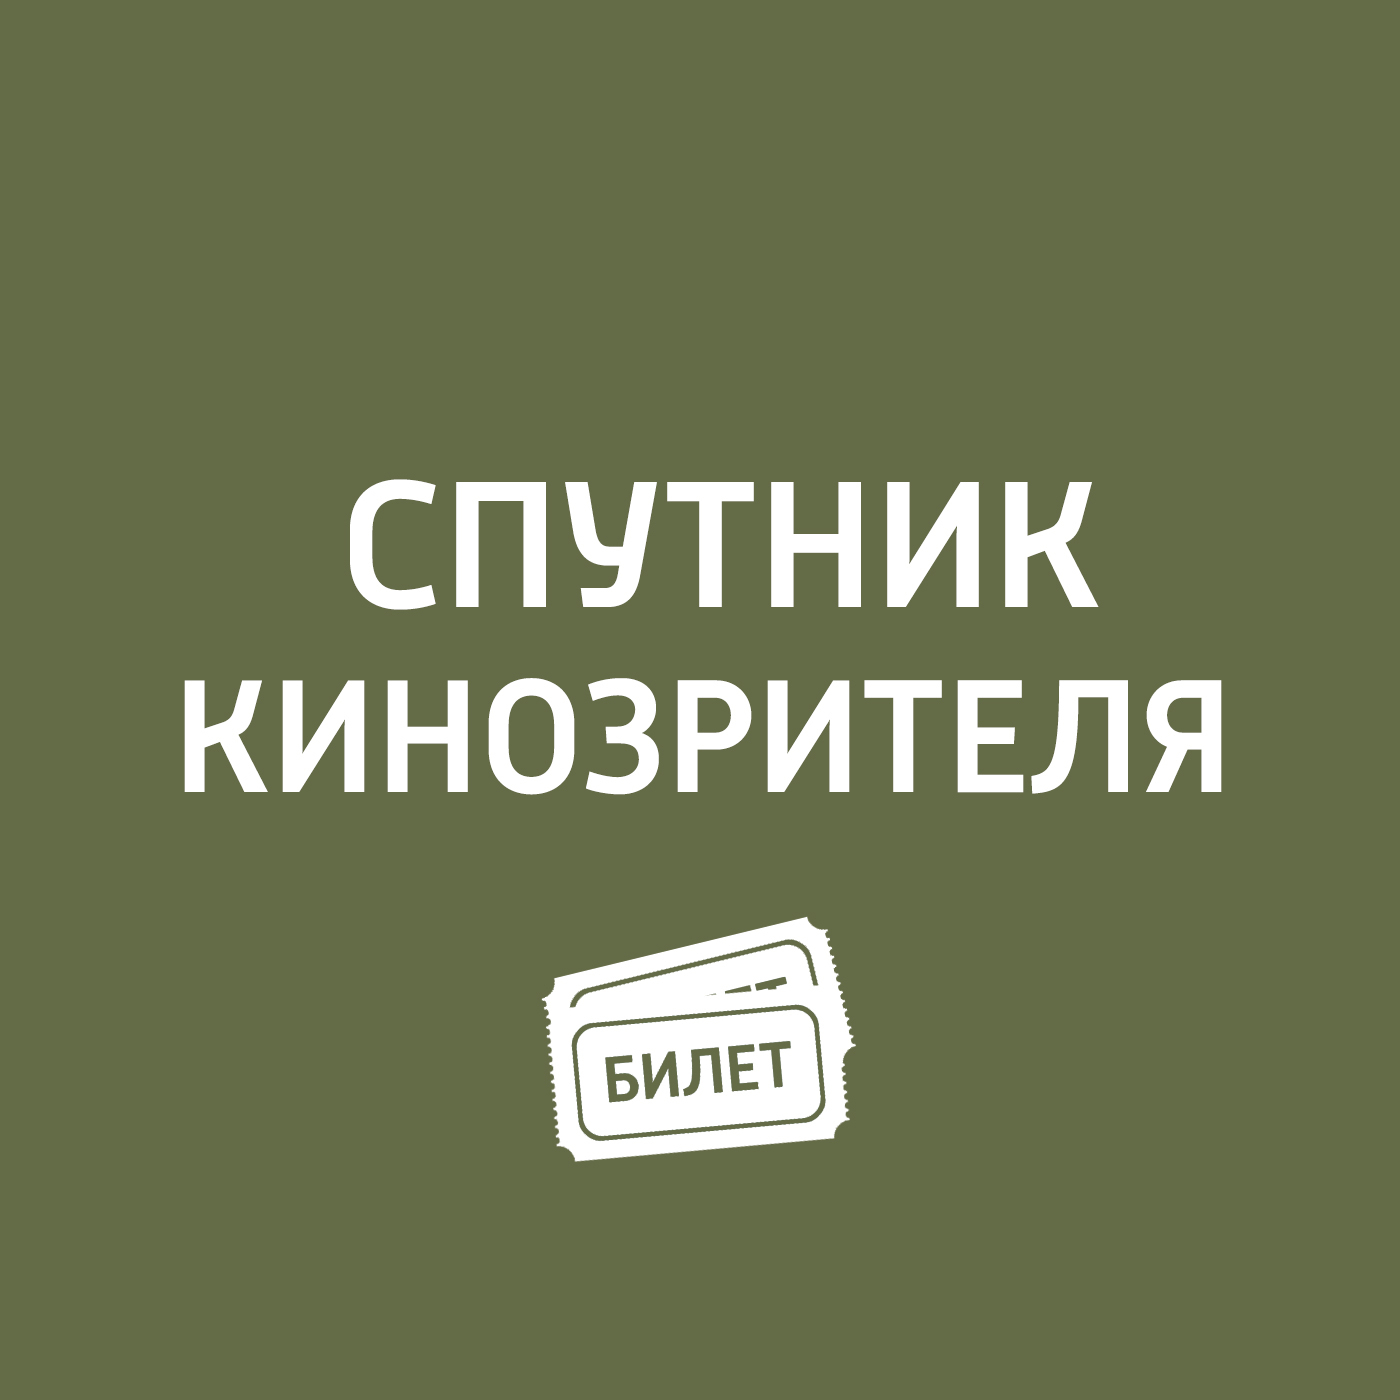 Антон Долин Грета Гарбо грета гарбо выпуск 2 4 в 1